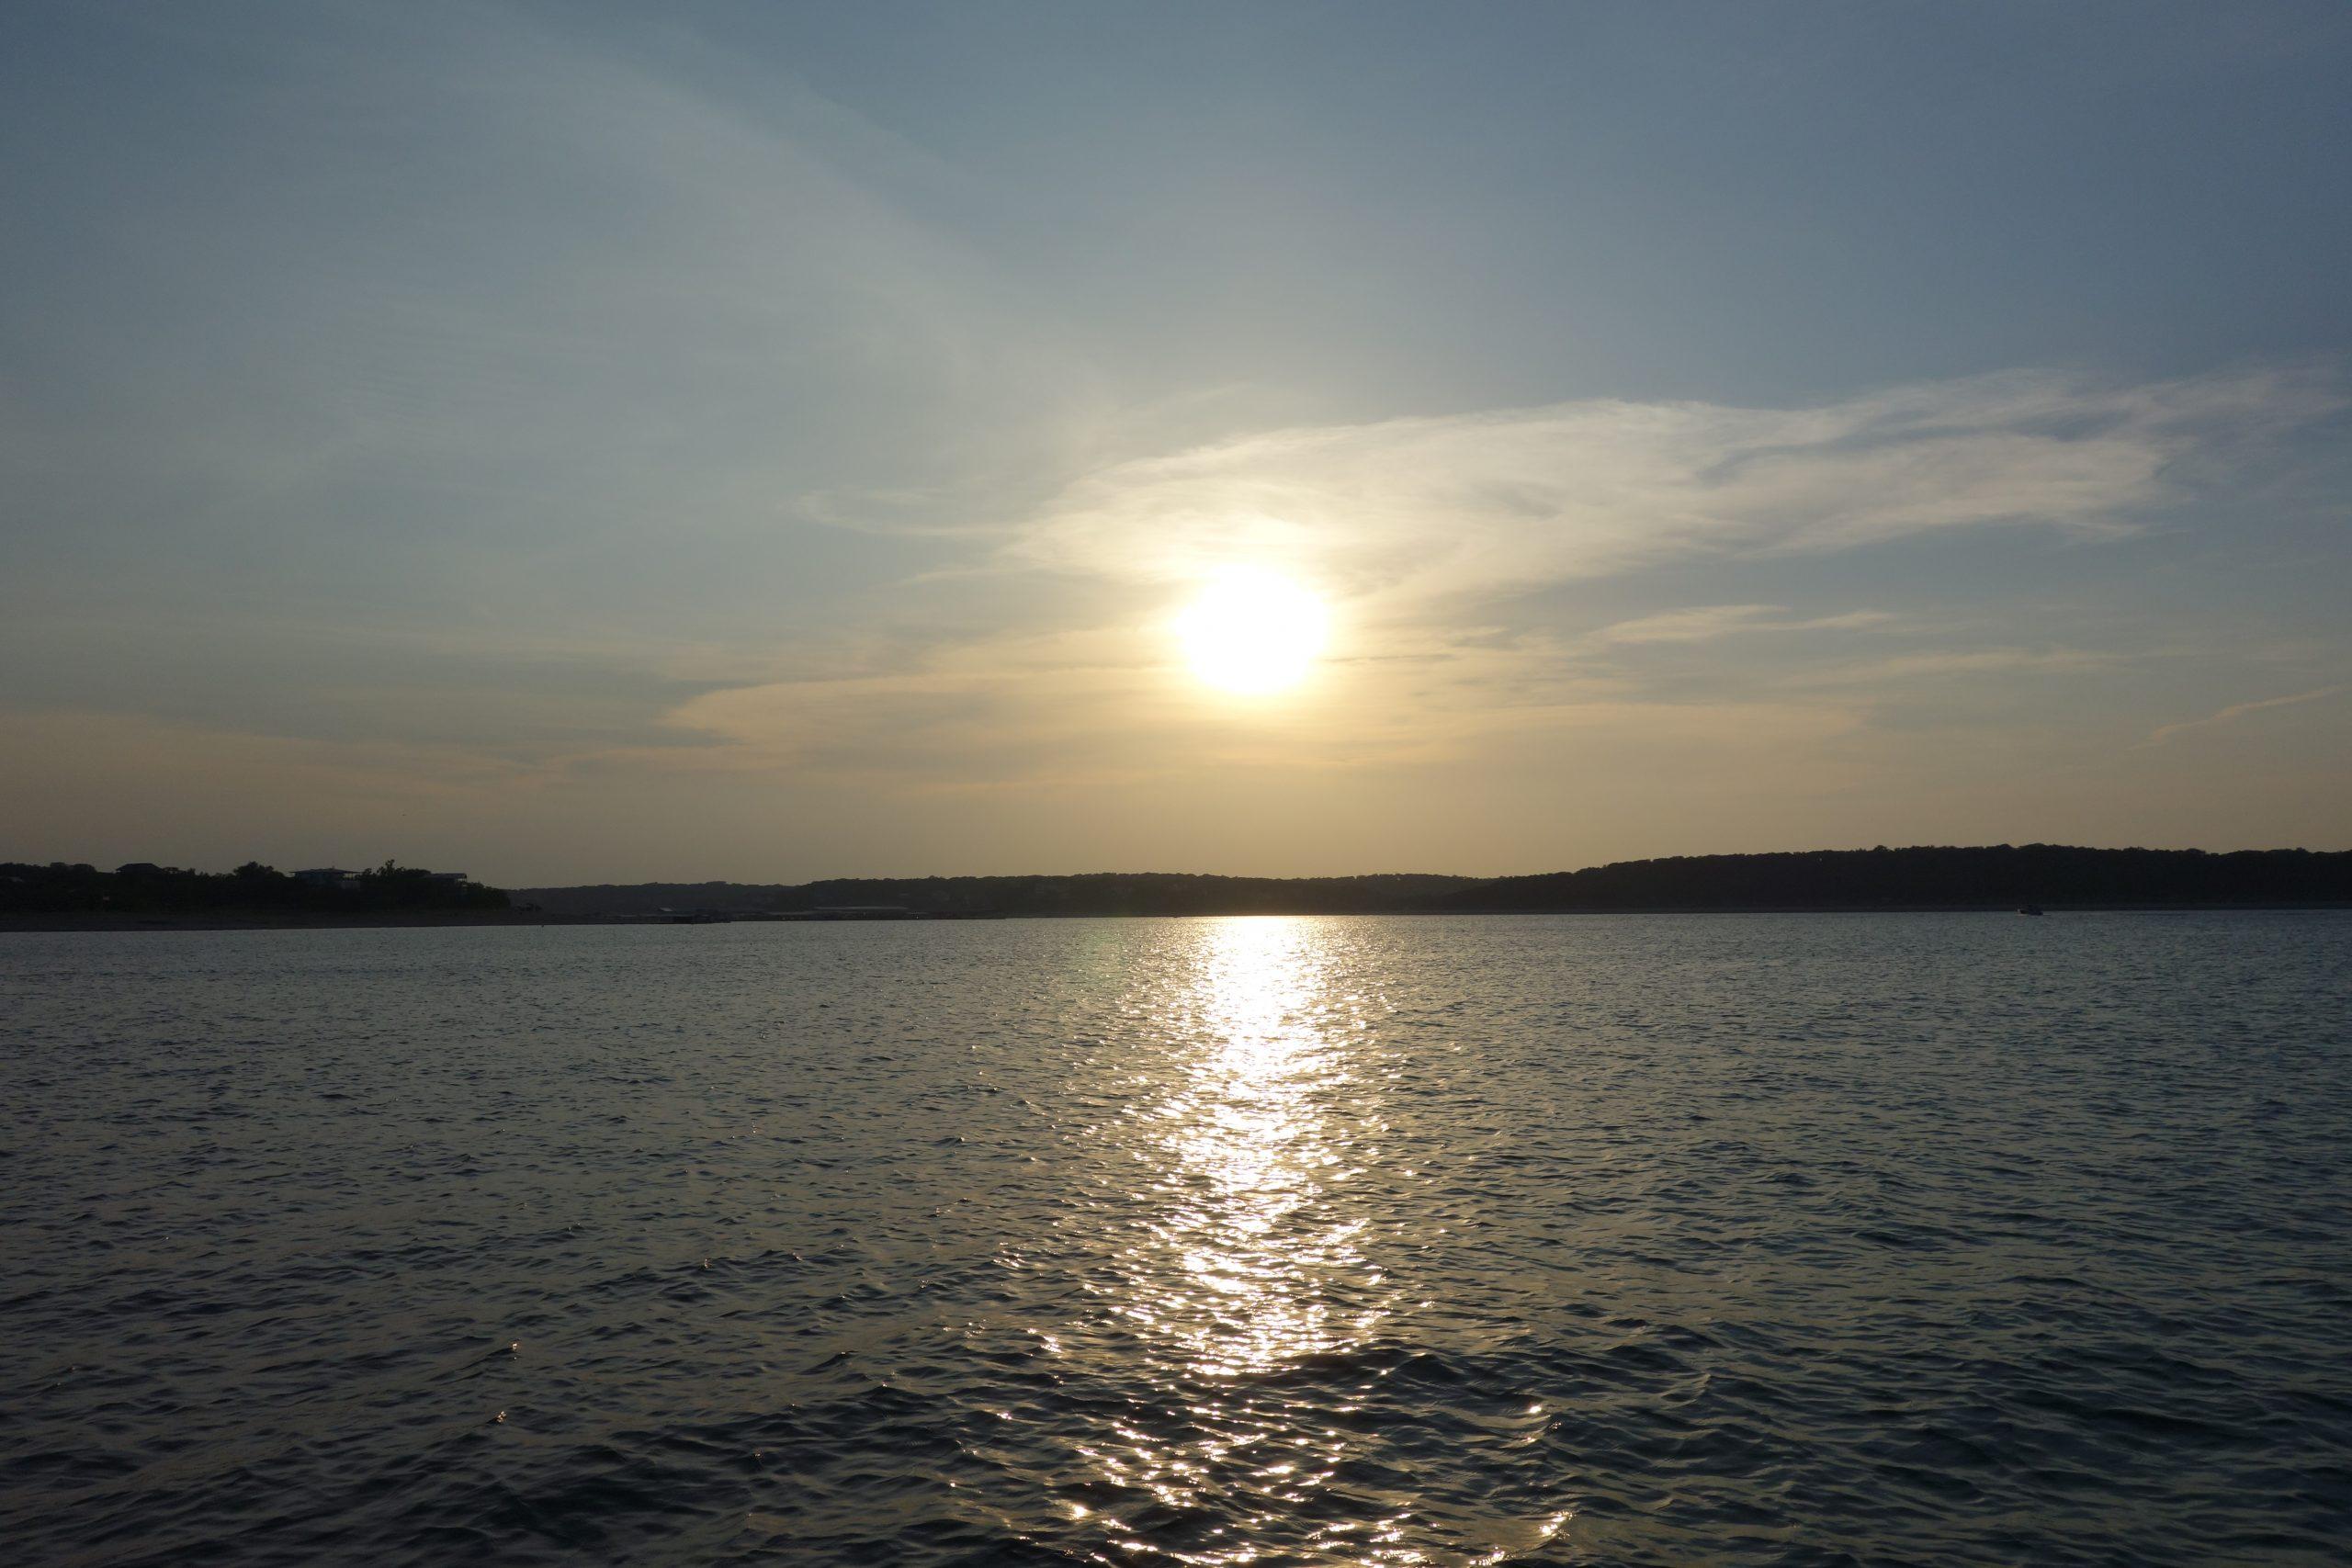 sunset-over-lake-travis